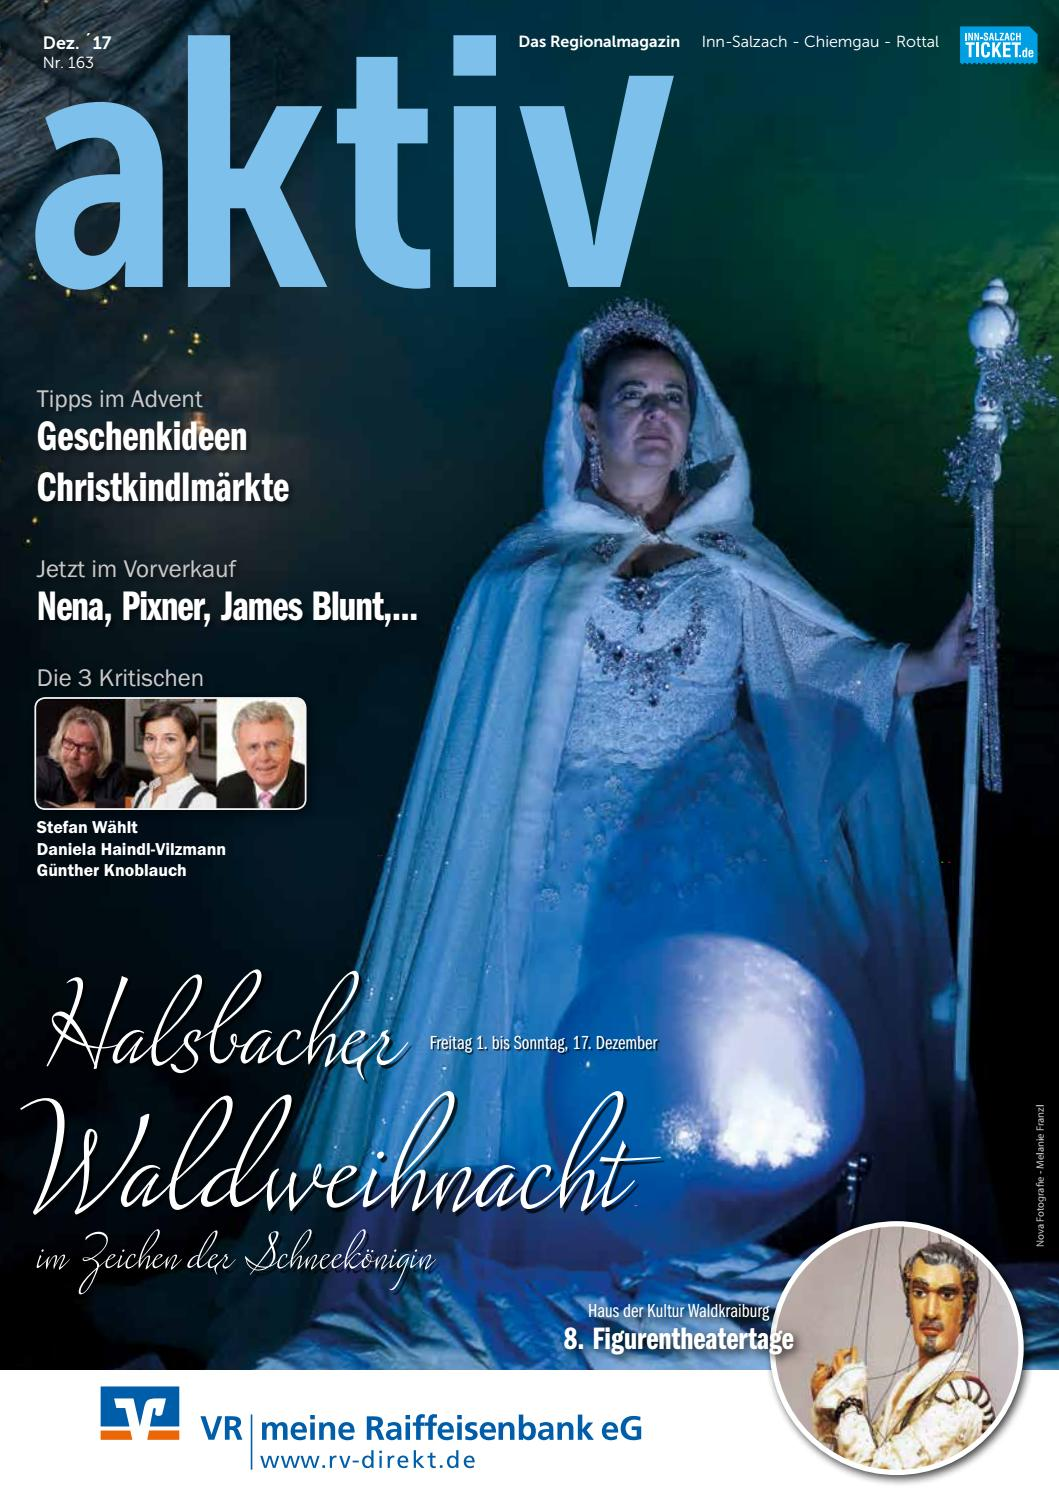 aktiv Das Regionalmagazin - Dez. // Nr. 163 by aktiv Das ...